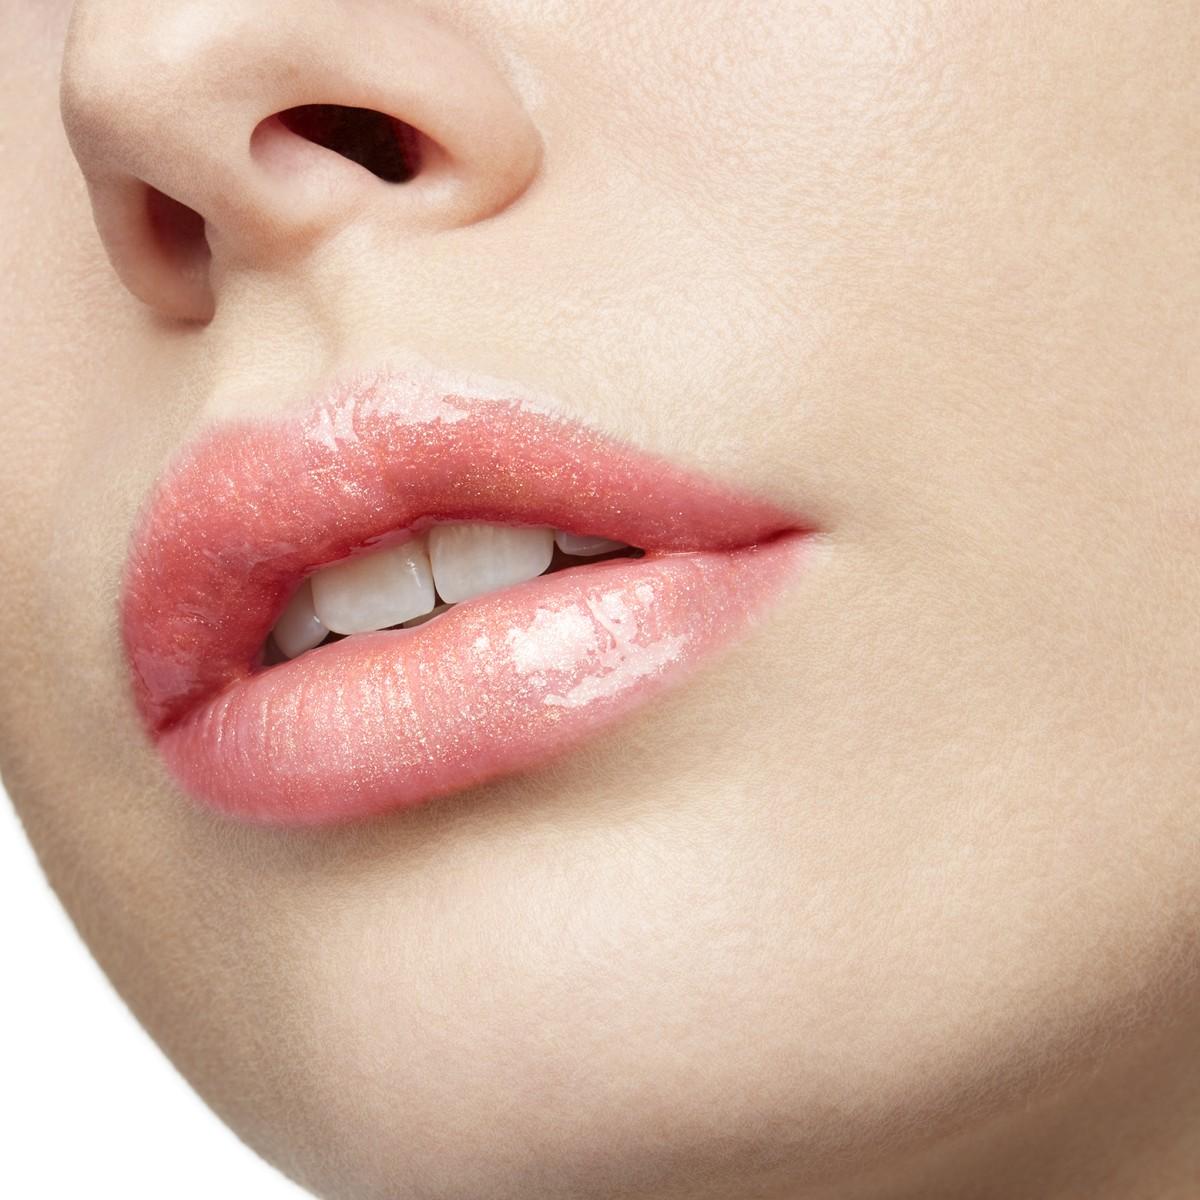 Beauty - Dollydola Loubilaque Lip Gloss - Christian Louboutin